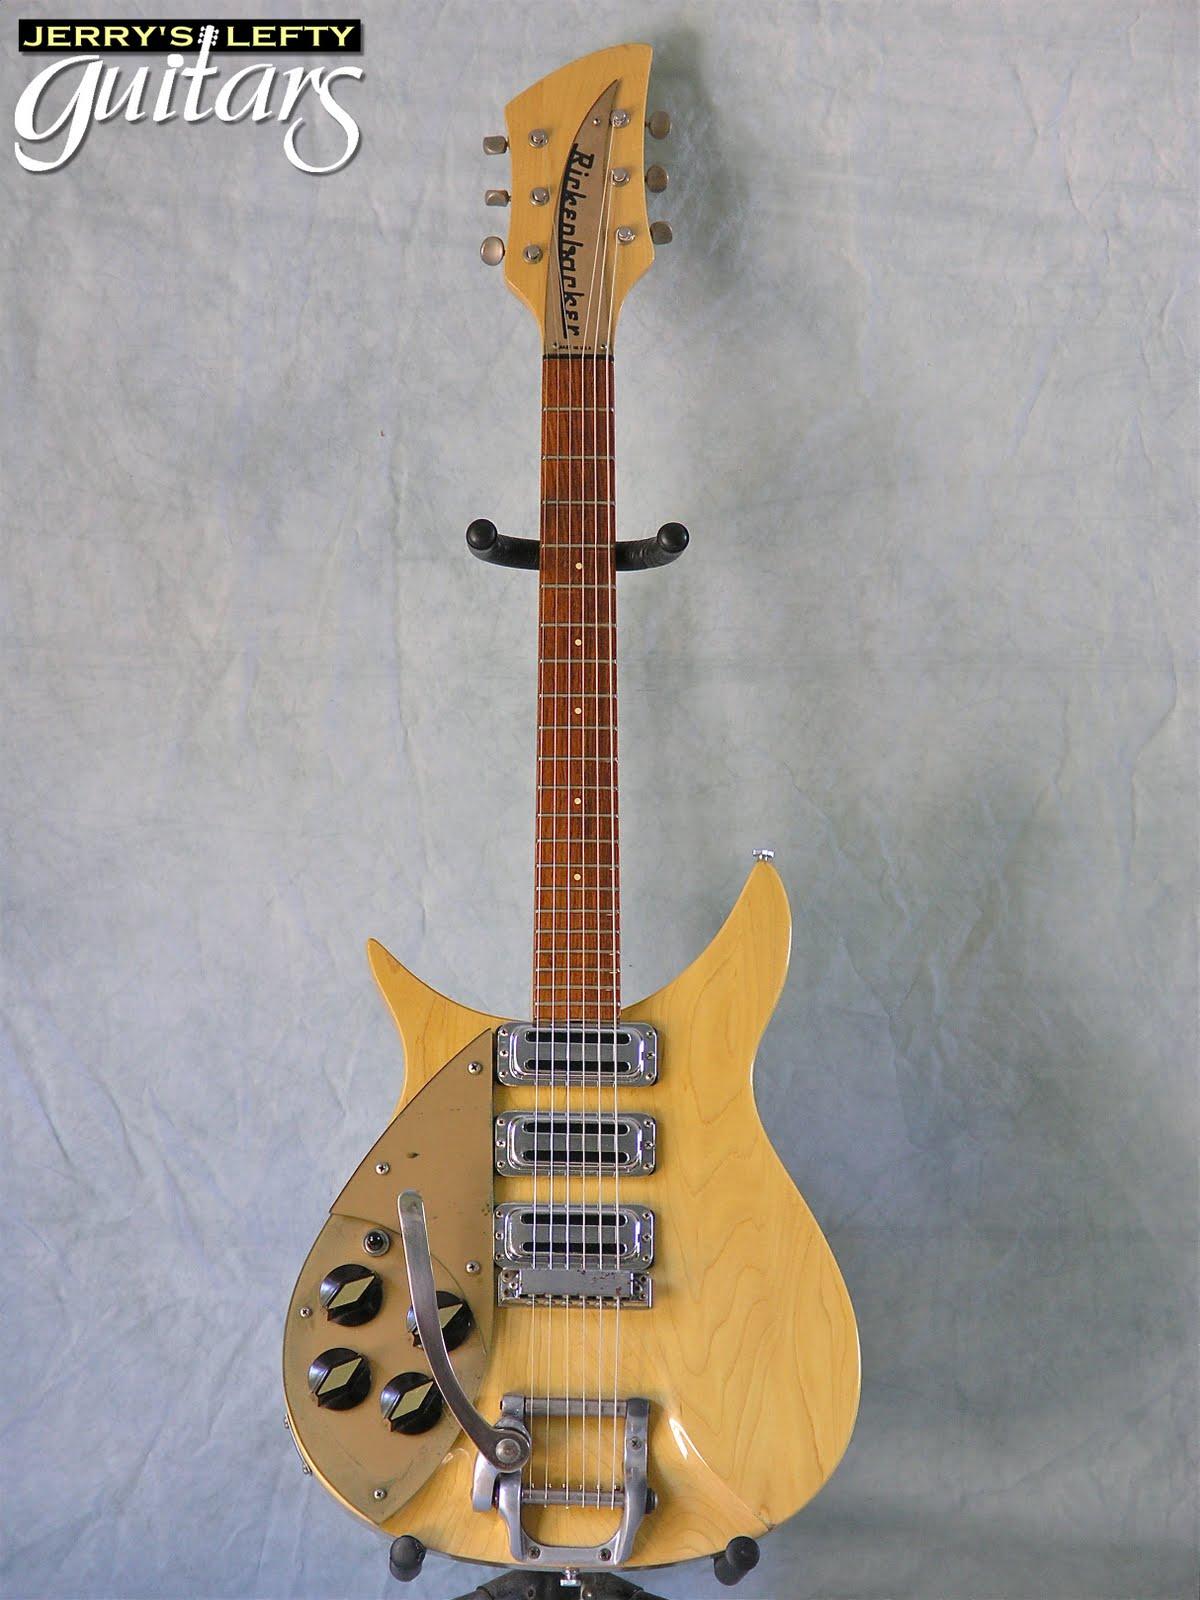 jerry 39 s lefty guitars newest guitar arrivals updated weekly 1986 rickenbacker 325 v59. Black Bedroom Furniture Sets. Home Design Ideas